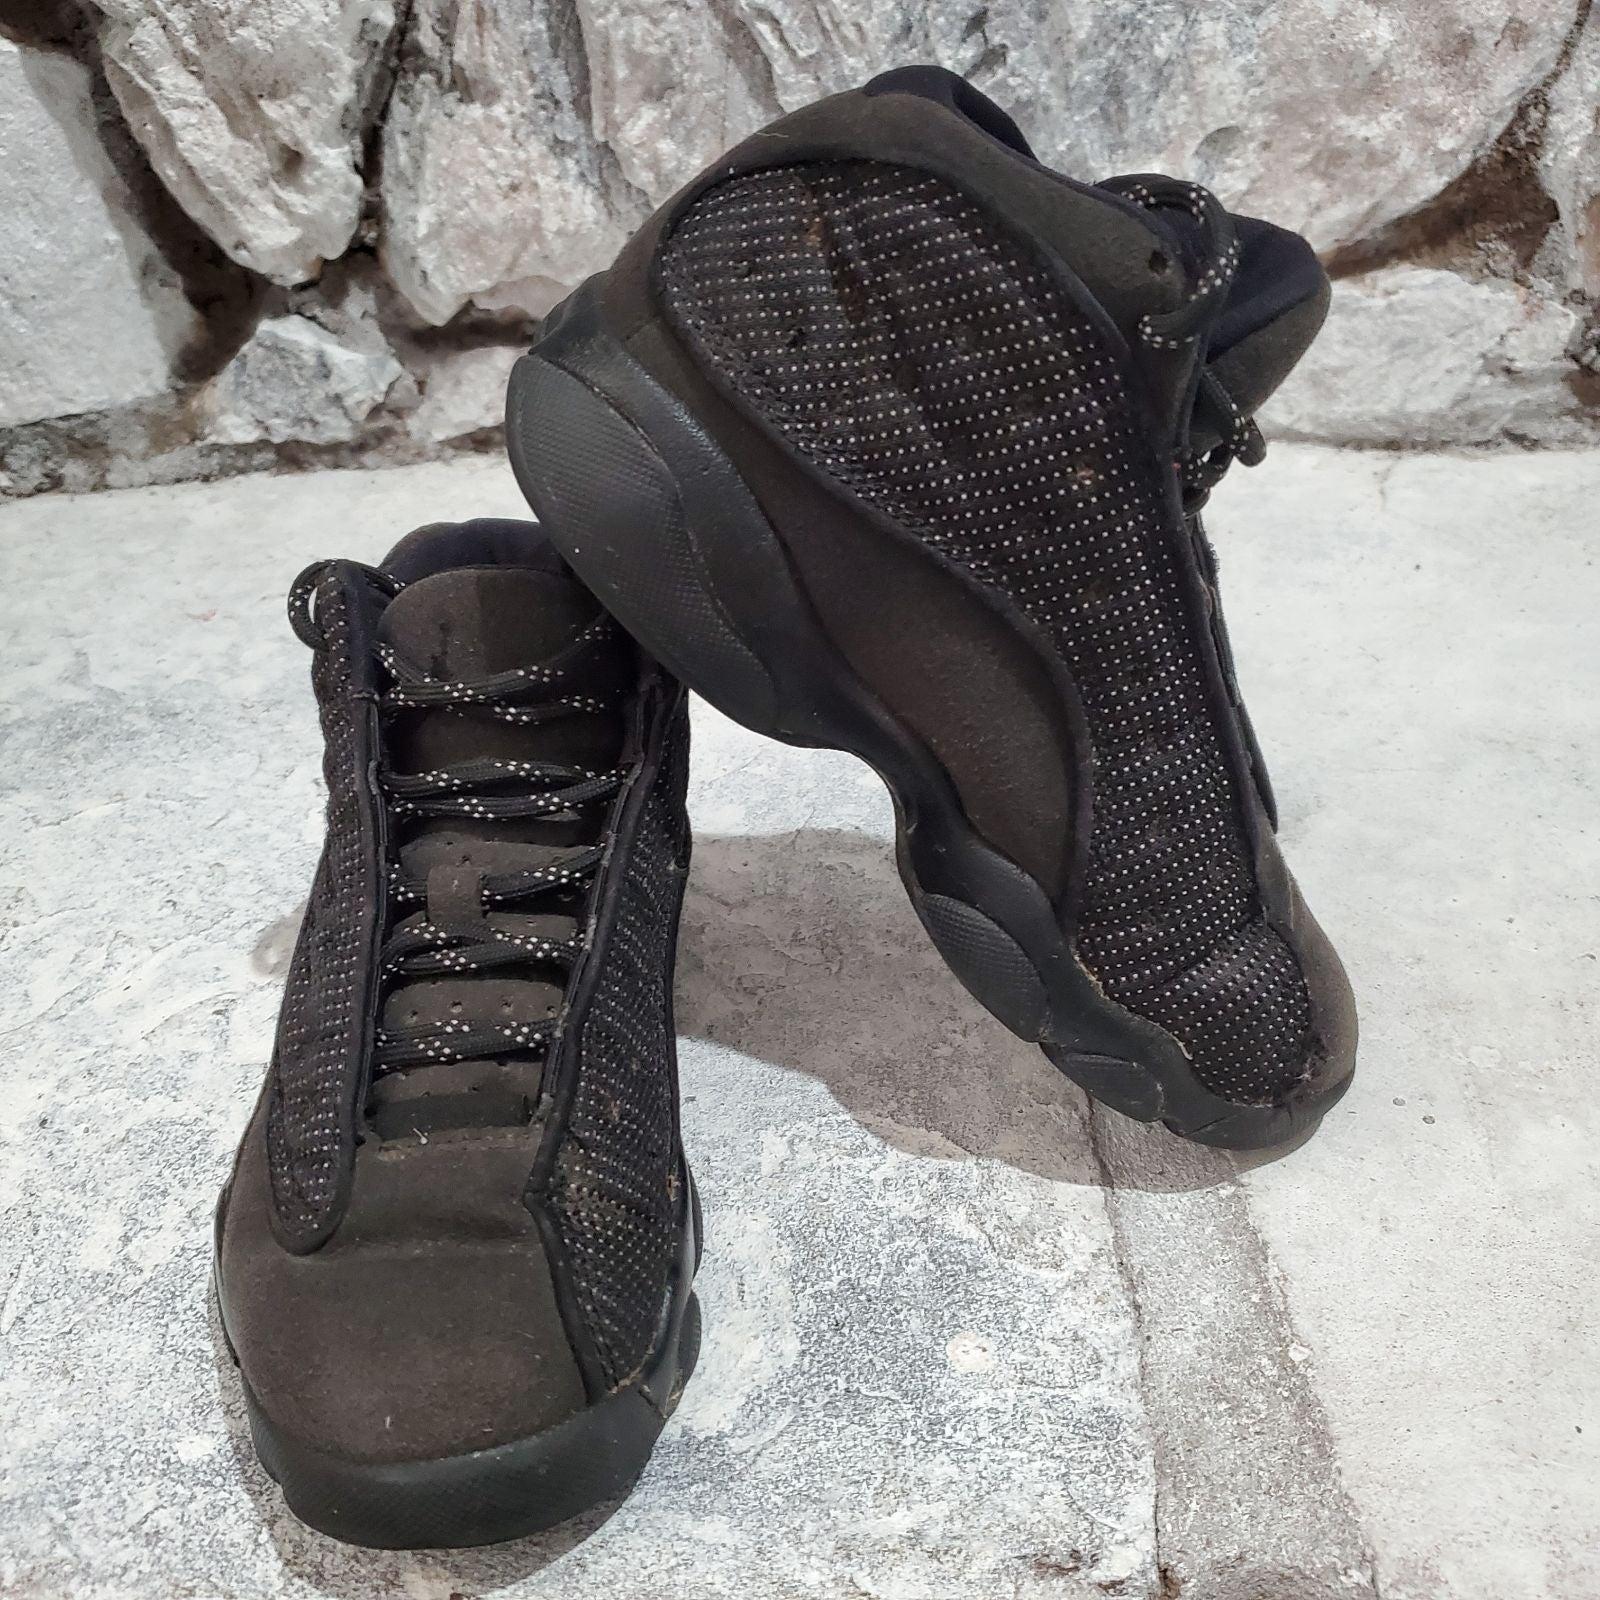 Jordan 13 Size Kids 13c Black